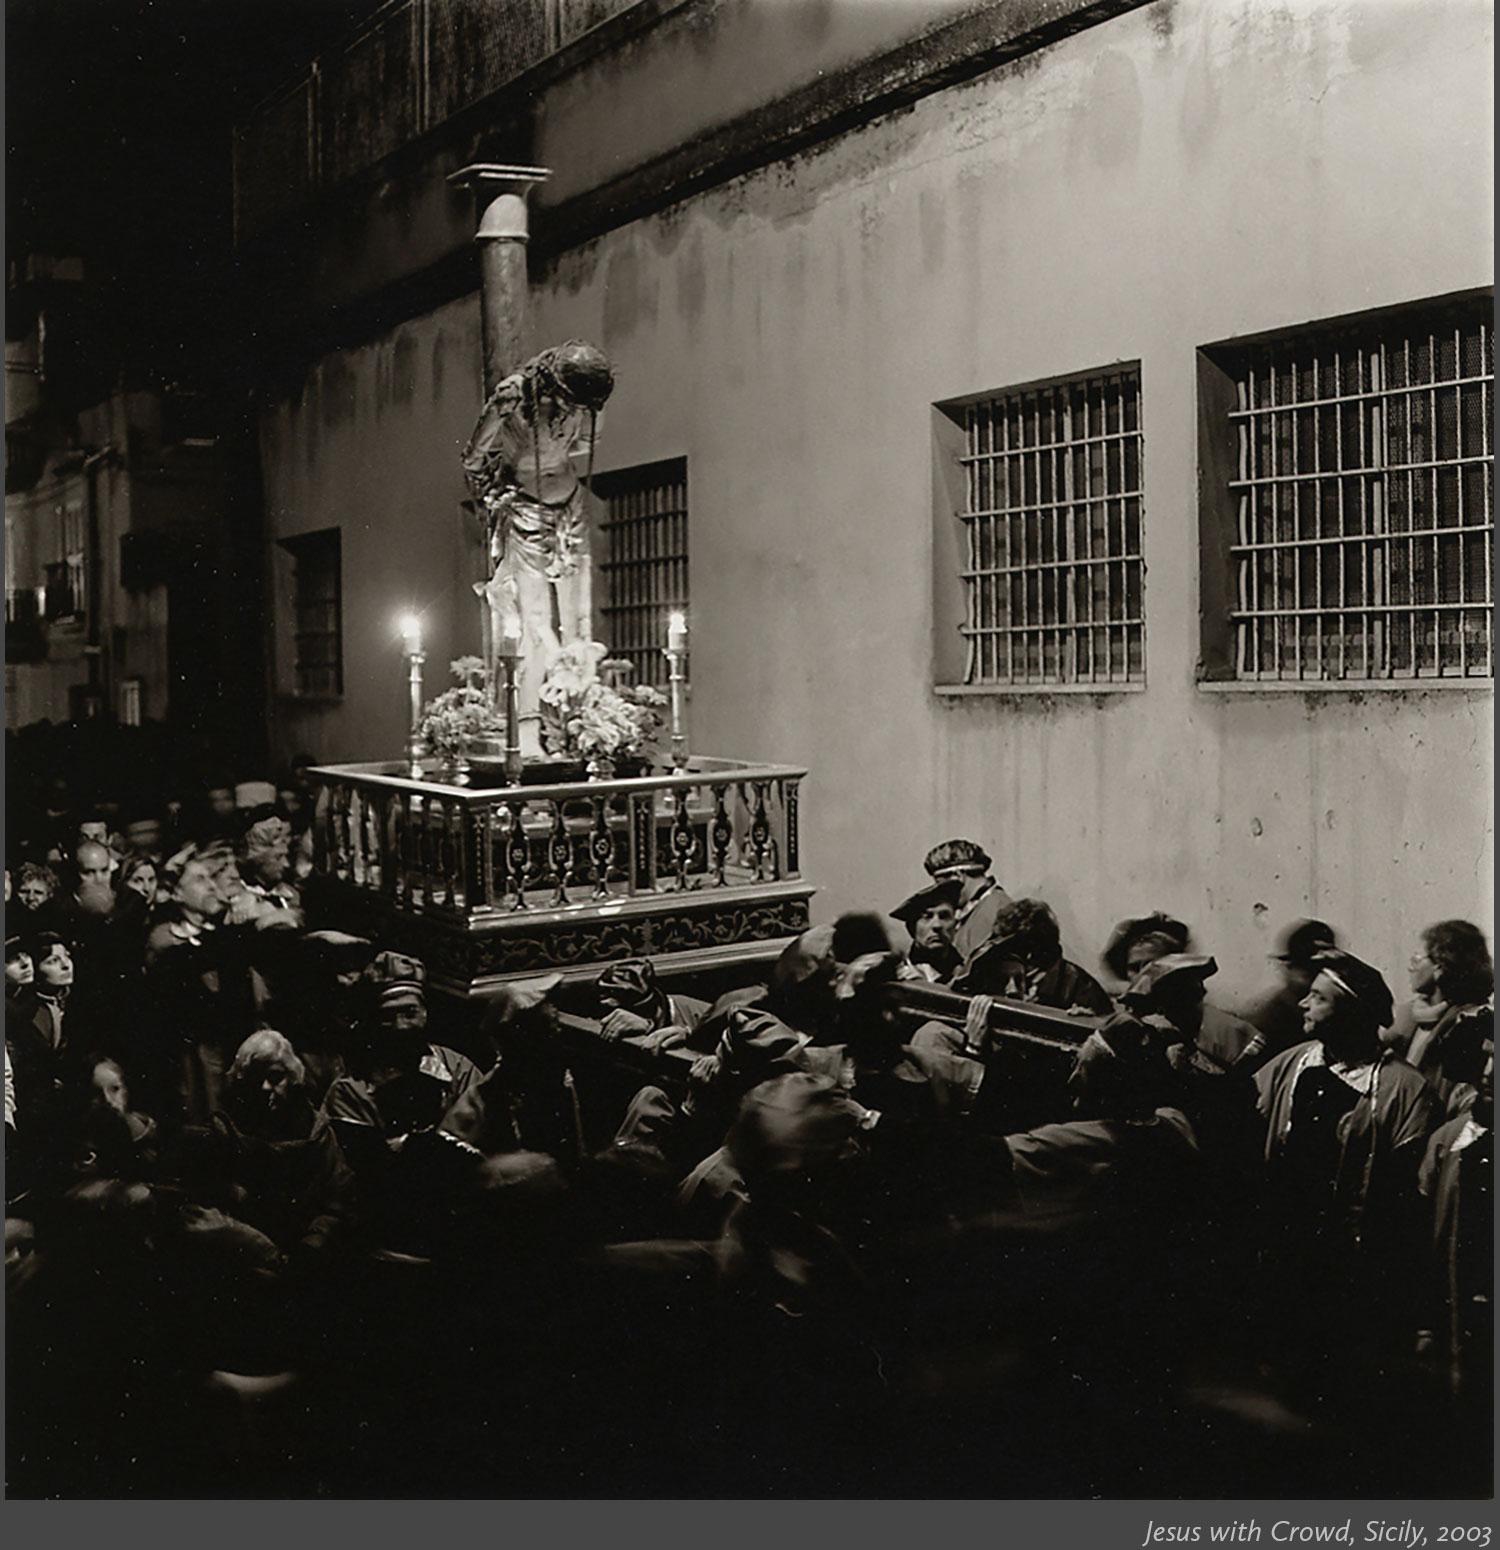 2_Jesus-with-Crowd,-Sicily,-2003.jpg